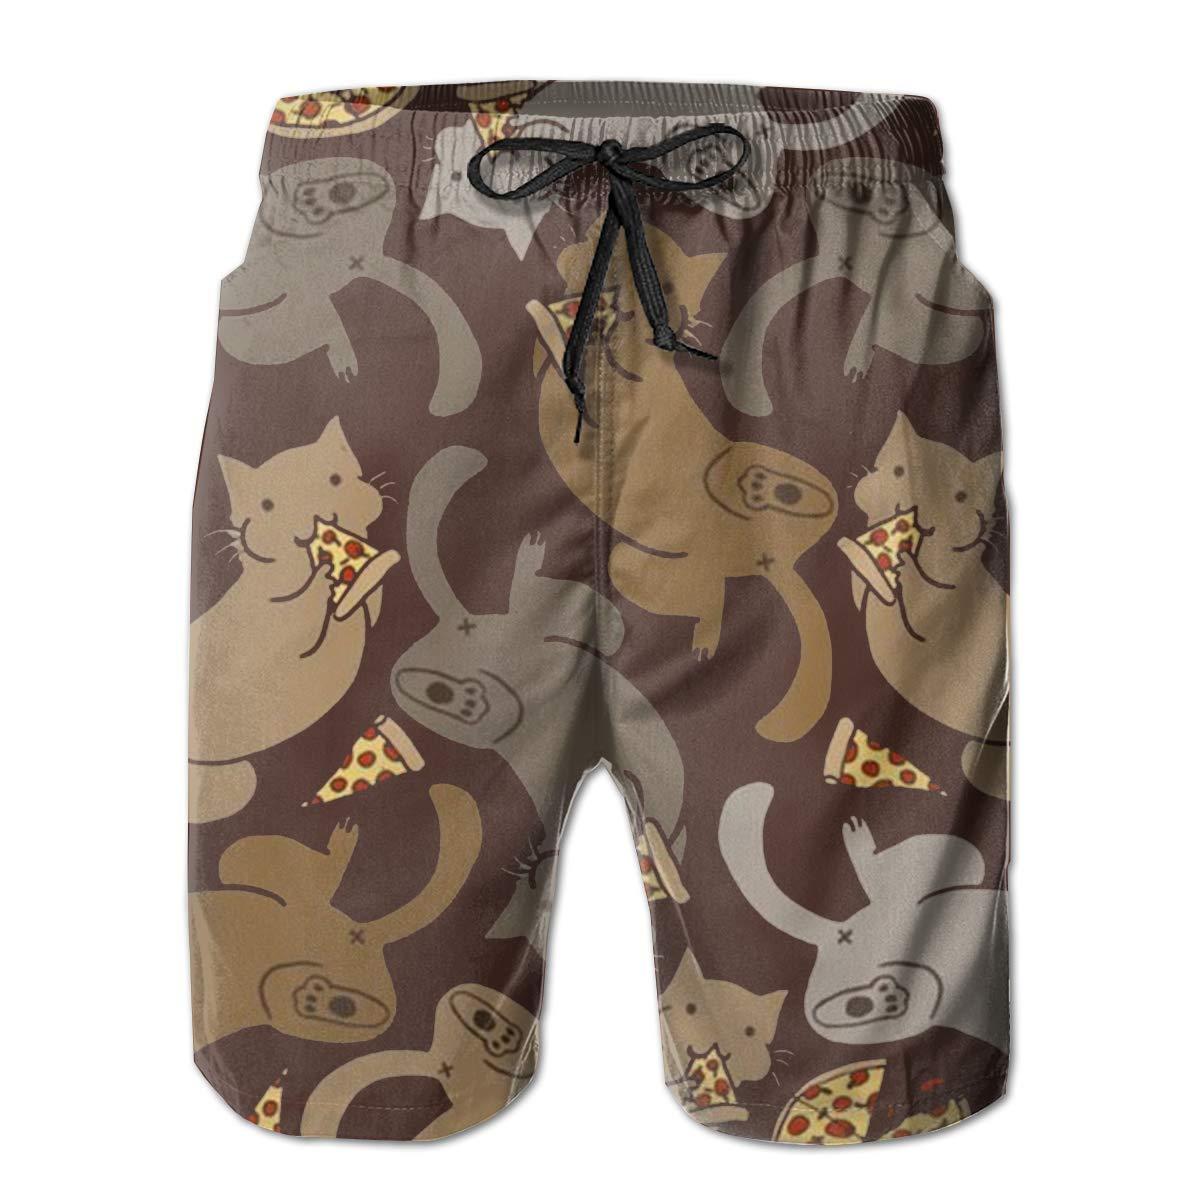 Pizza Cats Boardshorts Mens Swimtrunks Fashion Beach Shorts Casual Shorts Swim Trunks